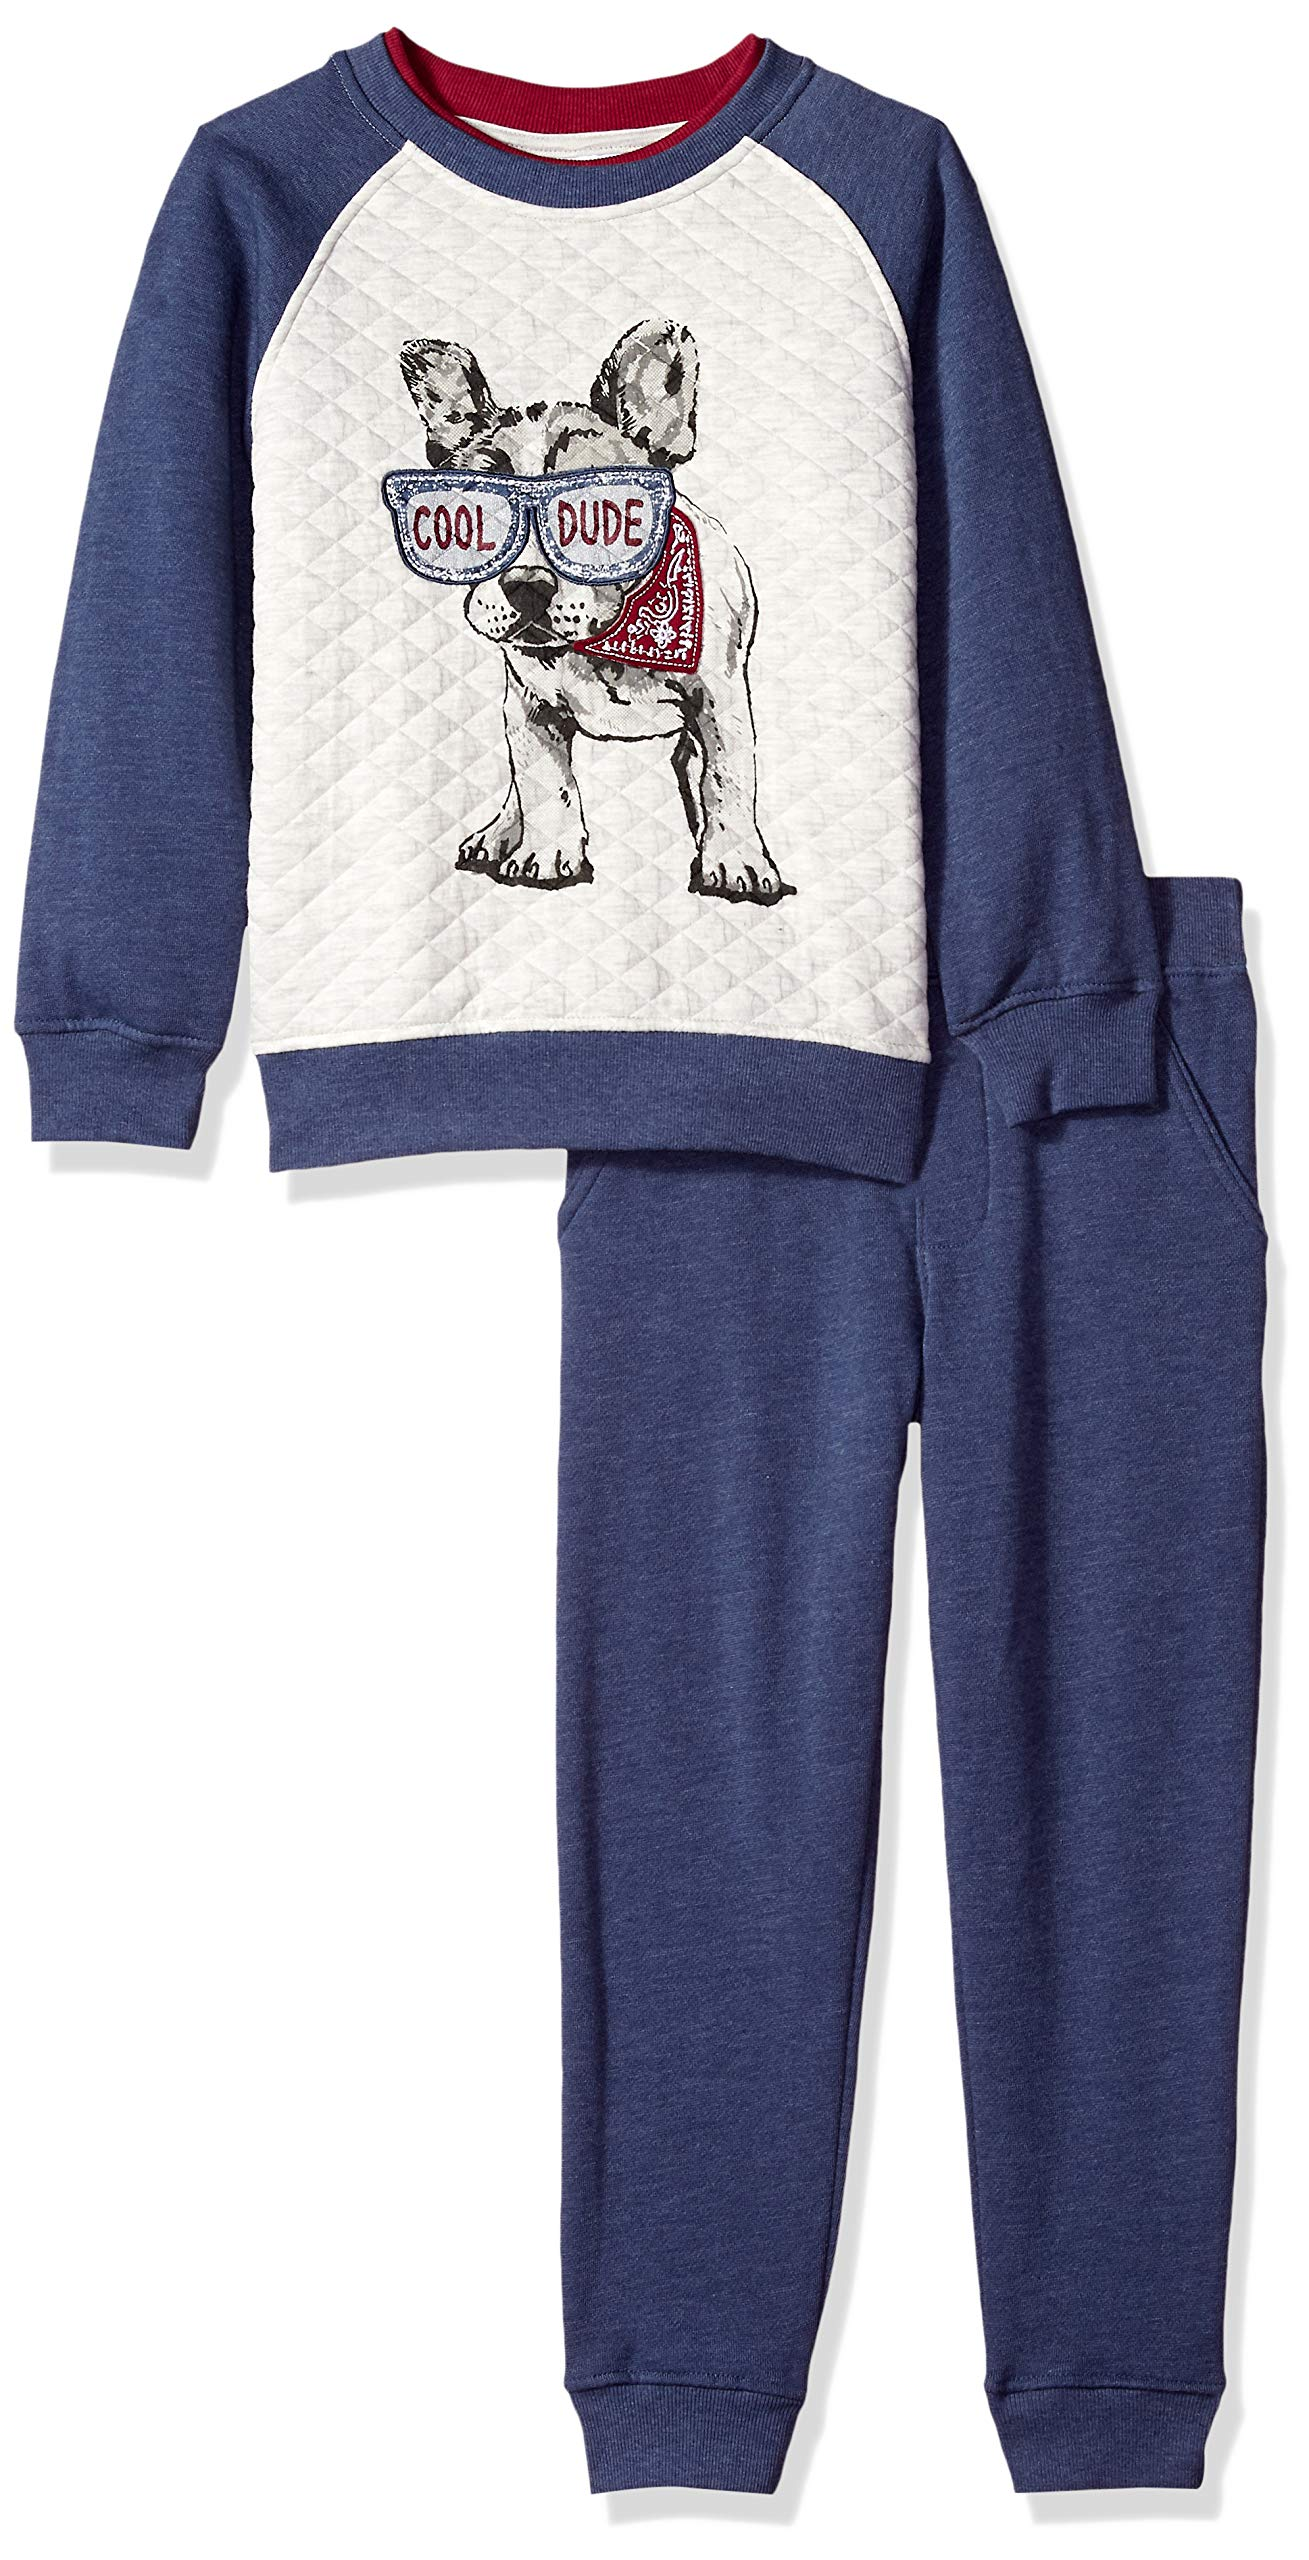 Kids Headquarters Boys' Little 2 Pieces Pullover Pant Set, Blue/Oatmeal, 4